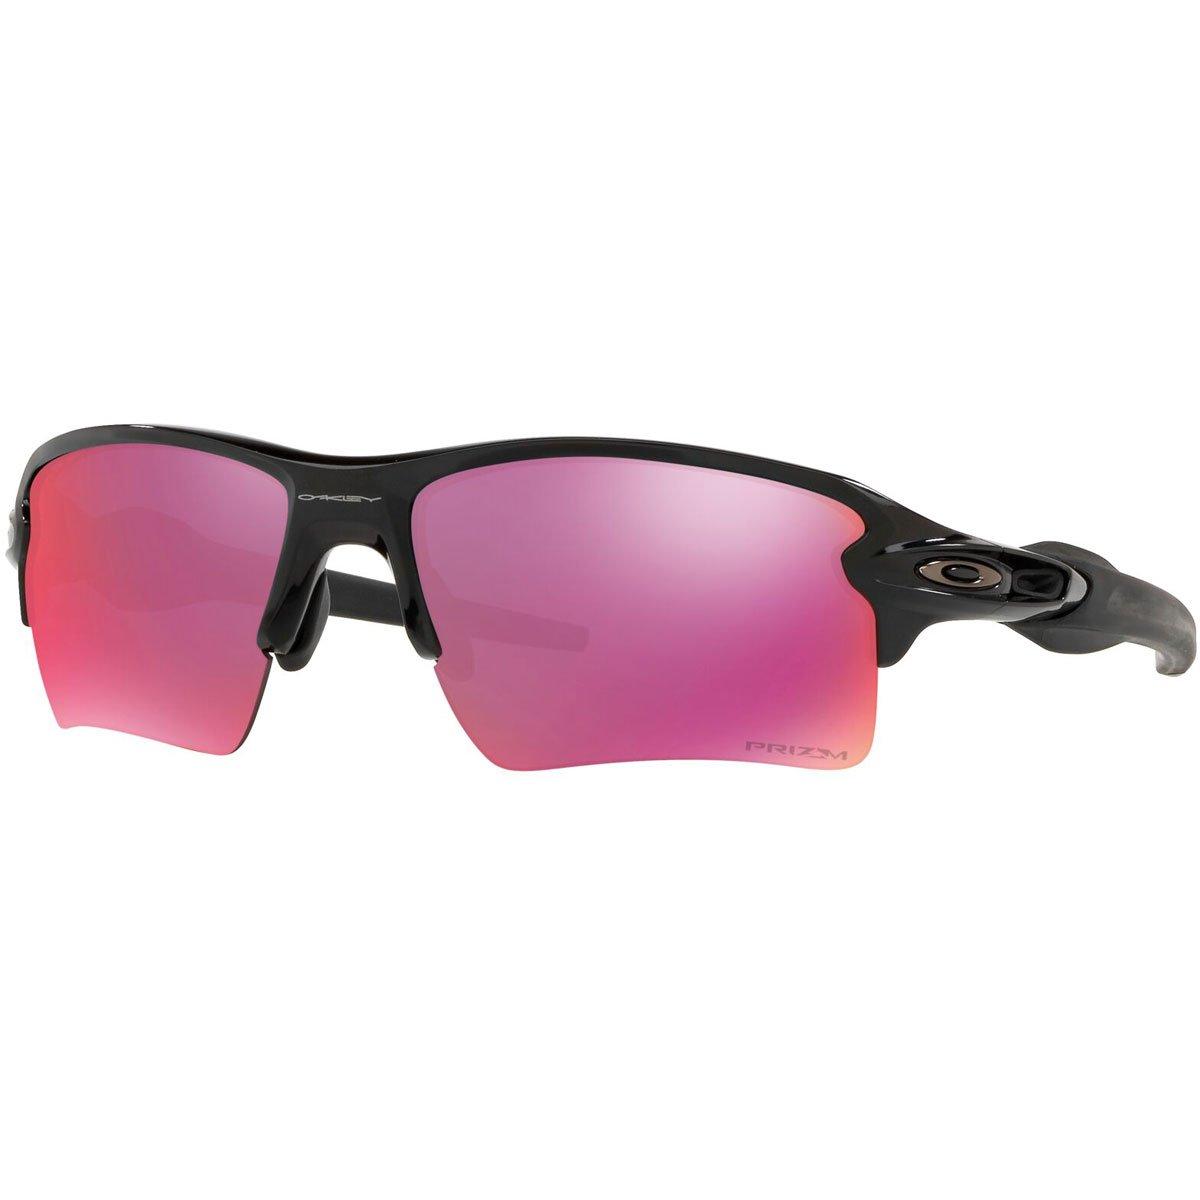 Oakley Flak 2.0 XL 9188 Gafas, Polished Black/PRIZMFIELD, 59 Hombres